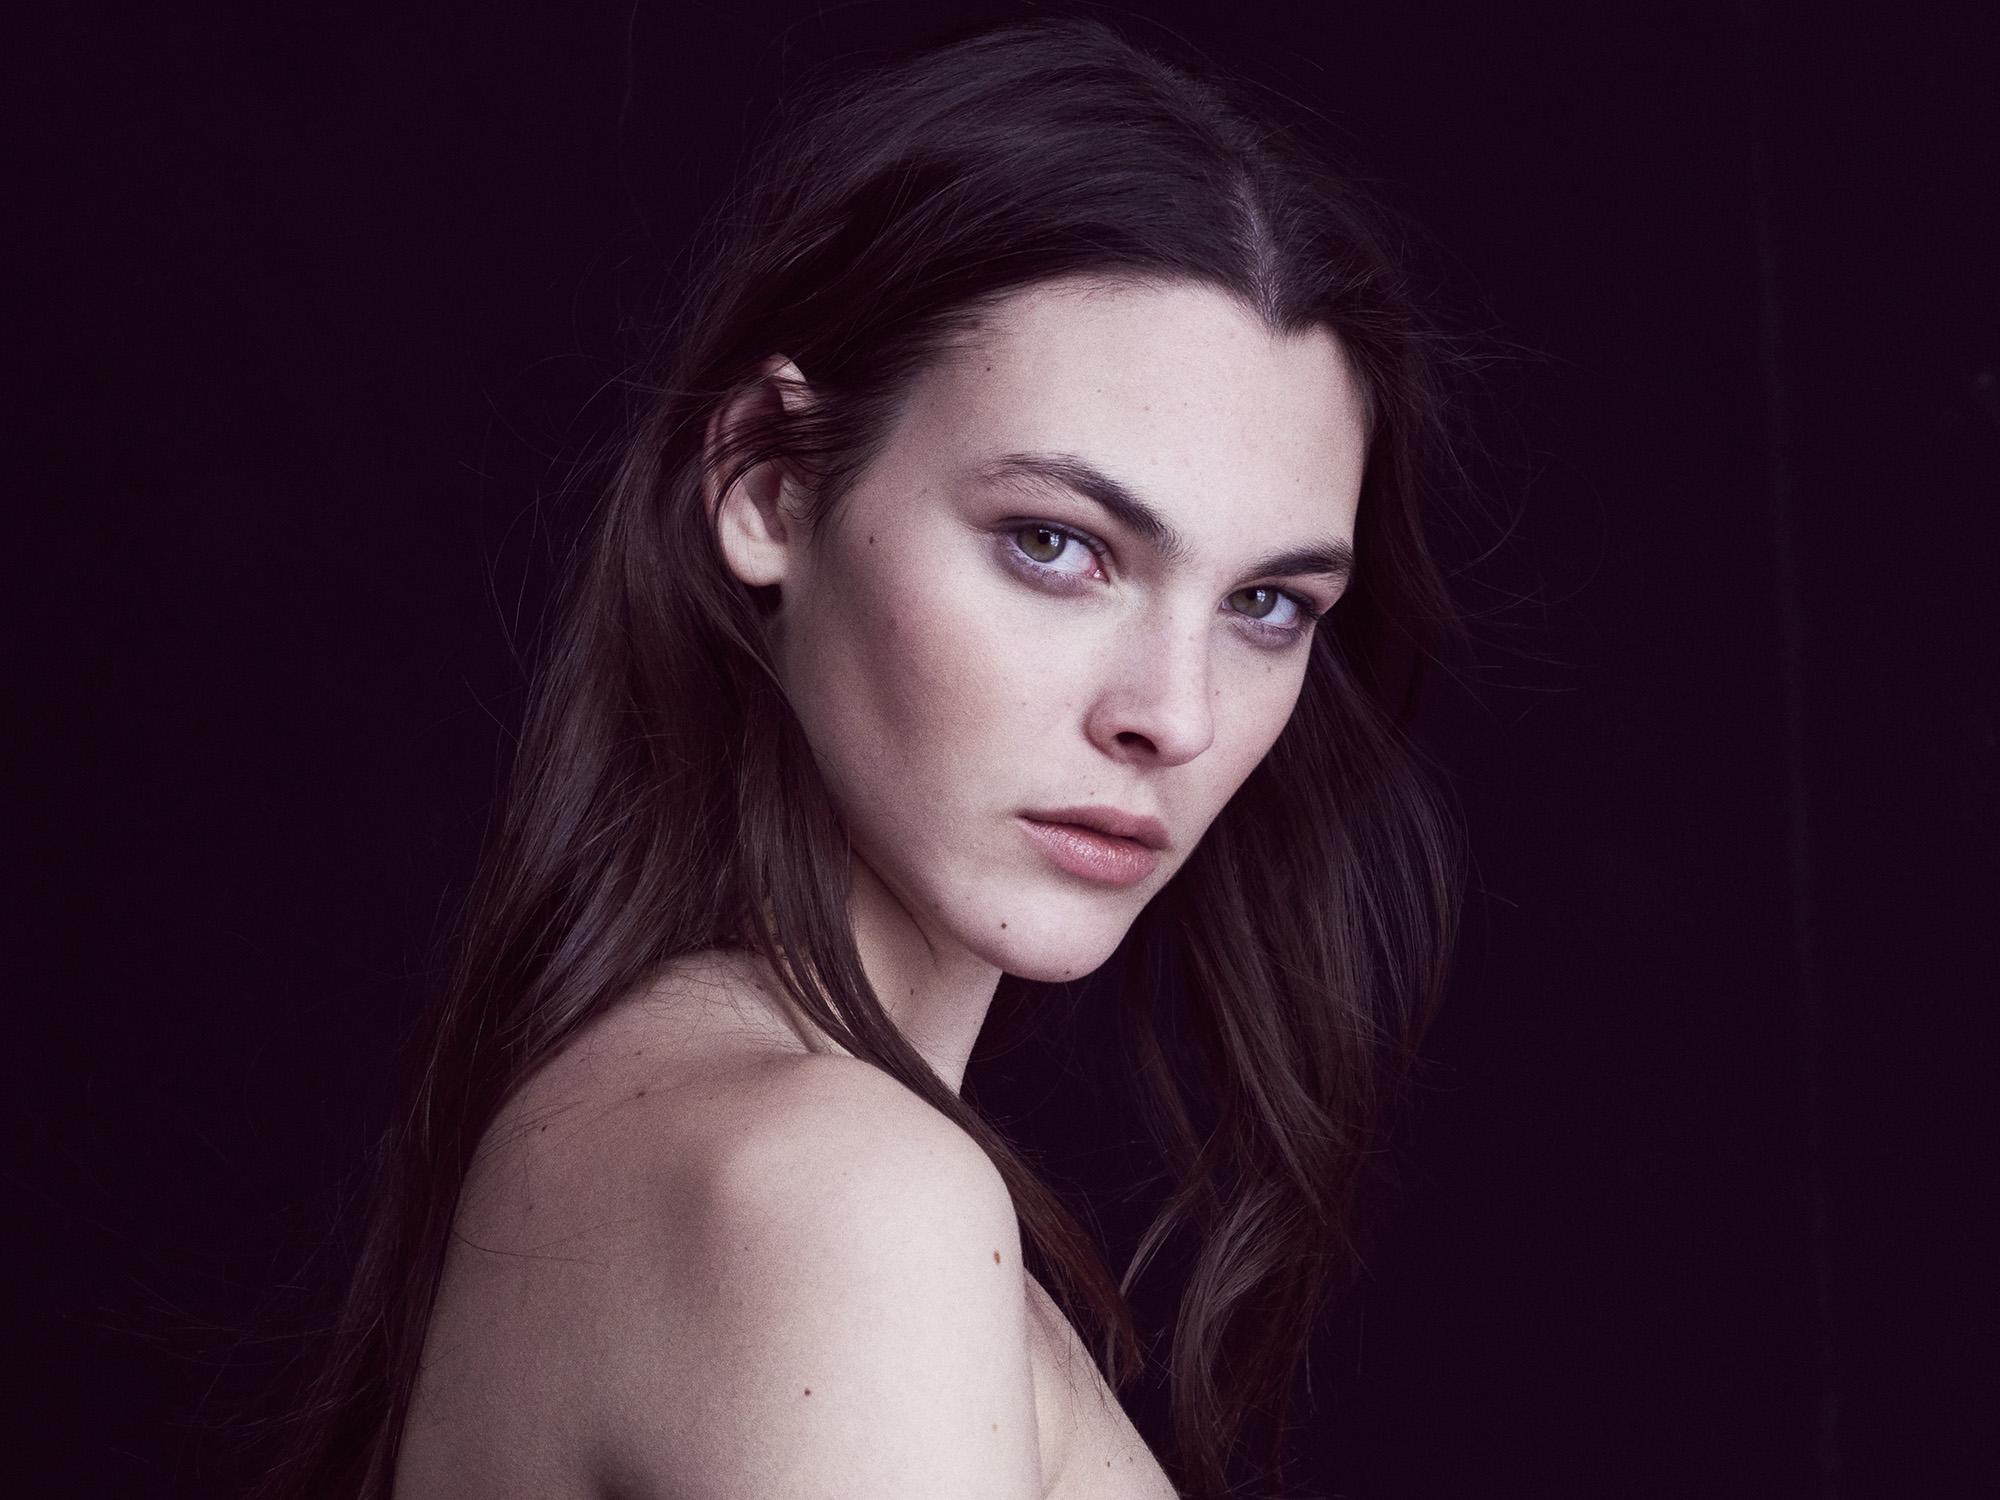 Pictures Melissa Dawson nude photos 2019